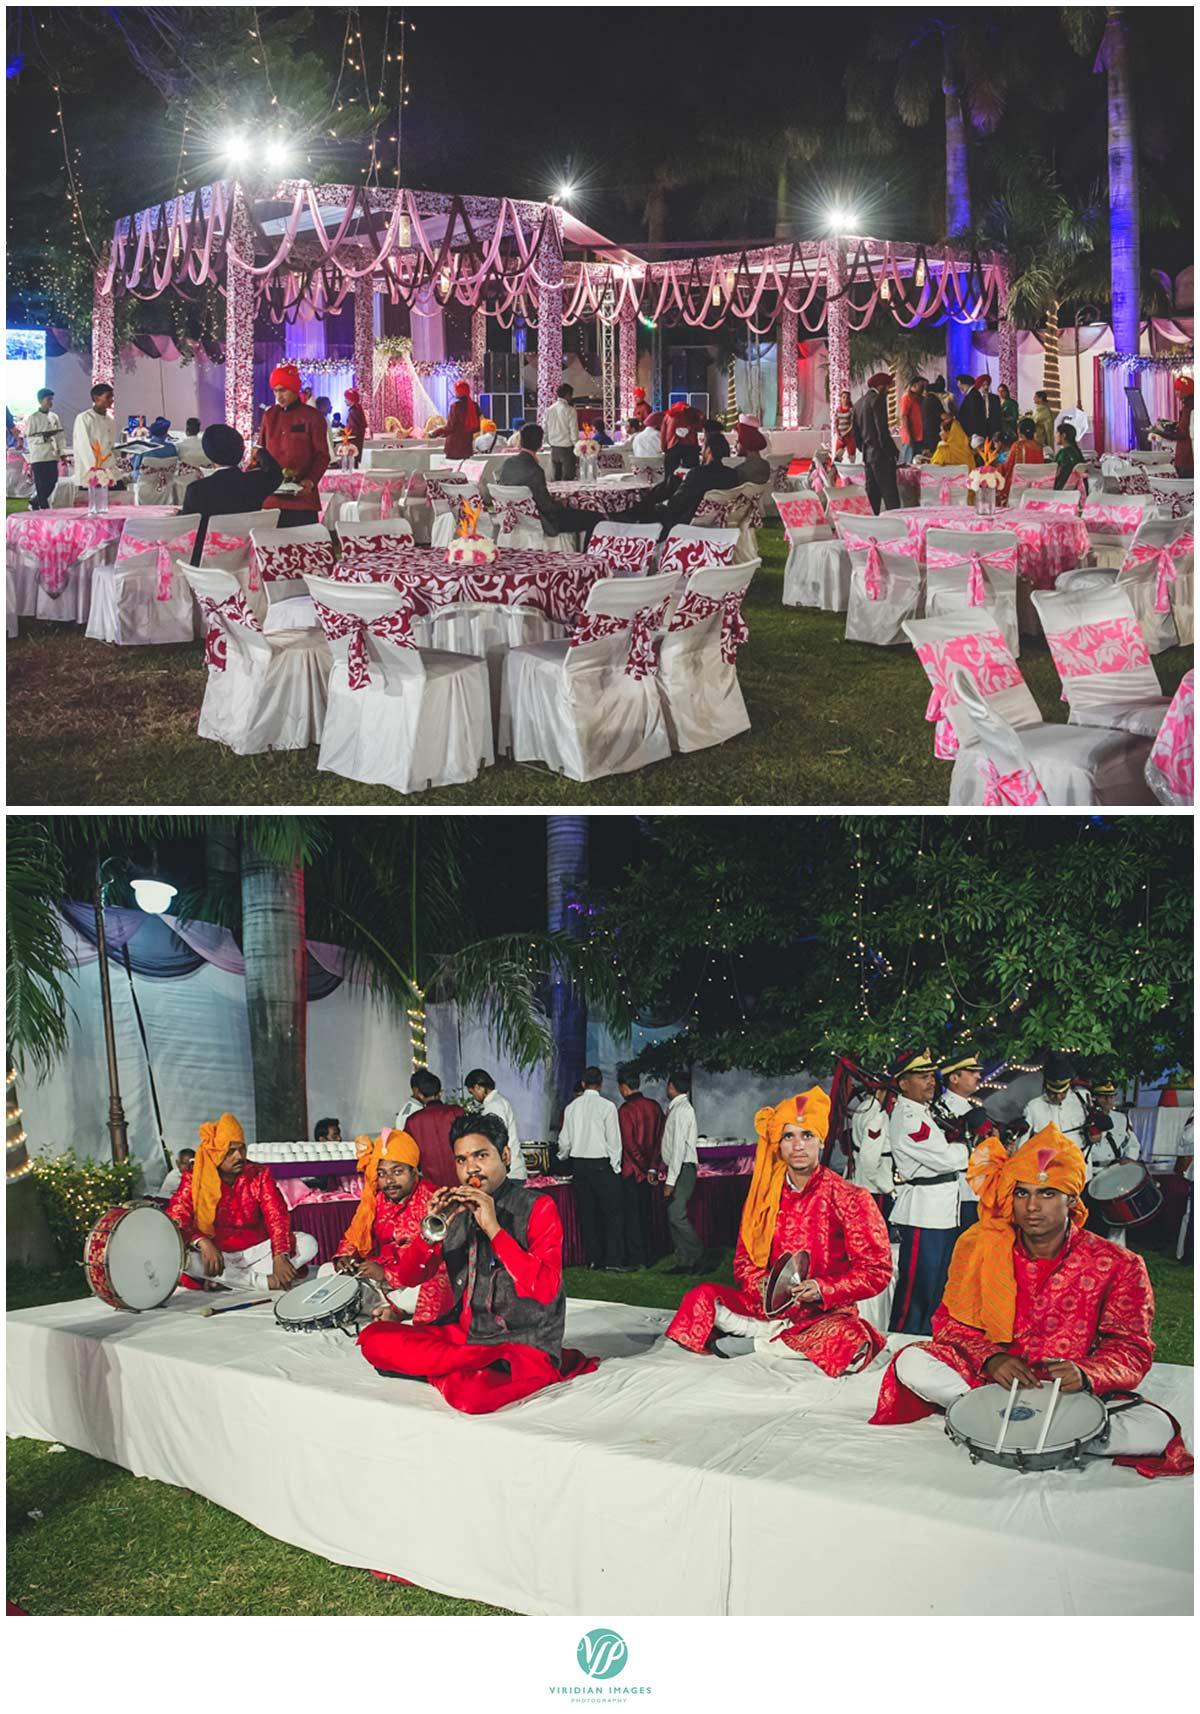 India_Pinjore_Garden_Reception_Viridian_Images_Photography_poto_3